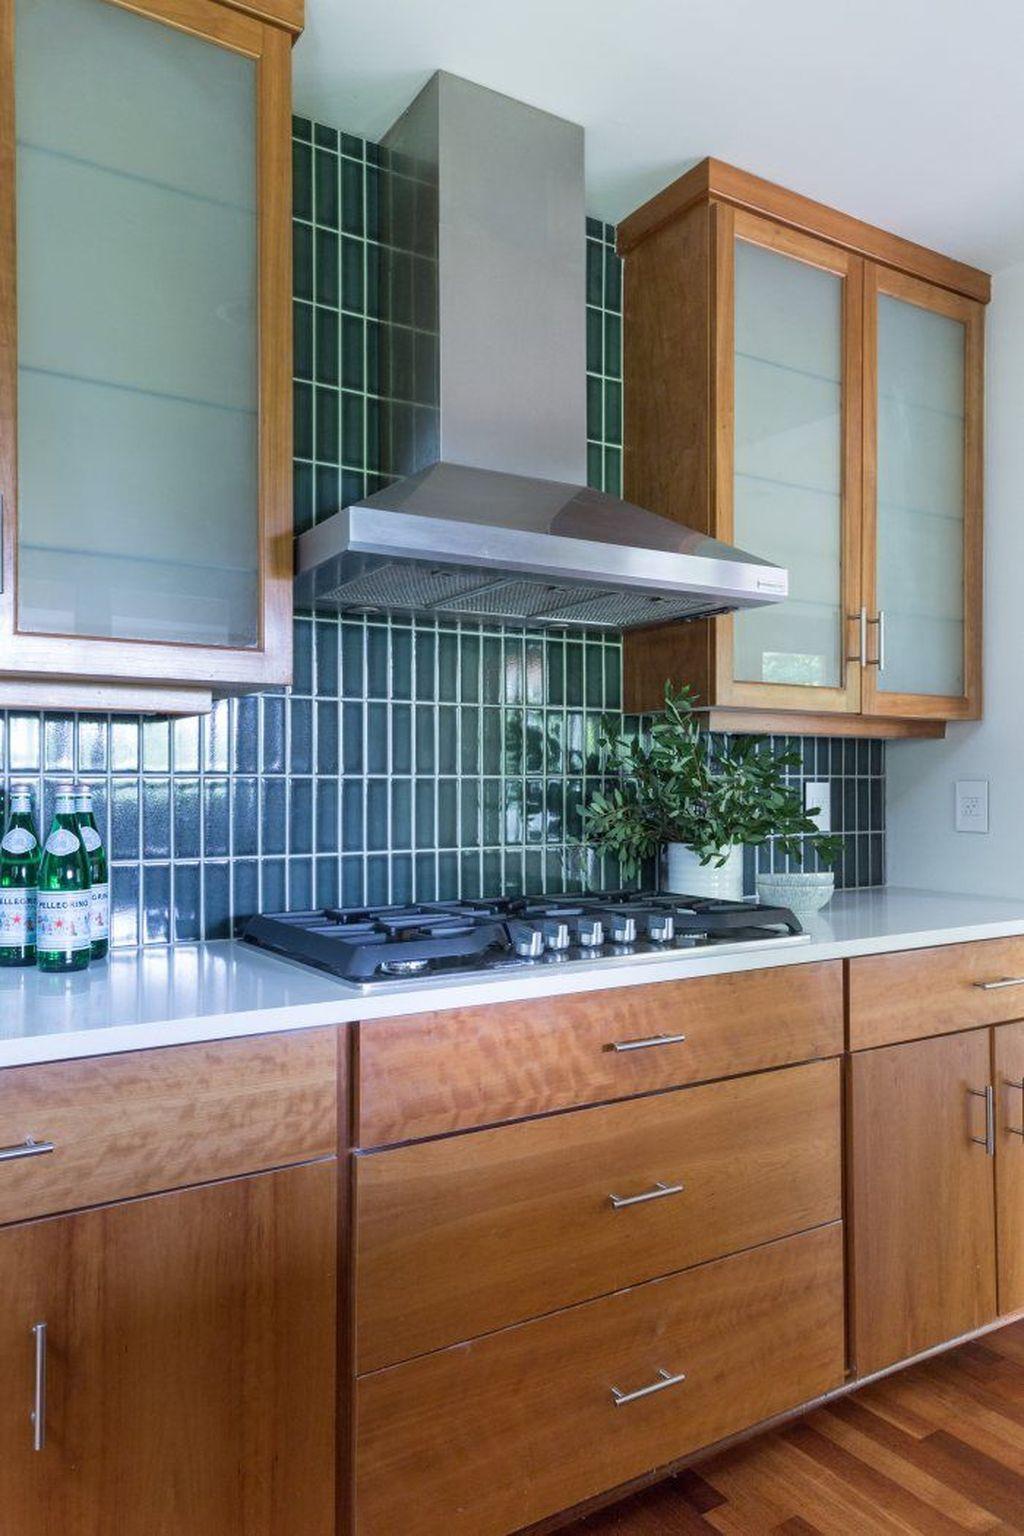 Stunning Glass Backsplash Kitchen Ideas 17